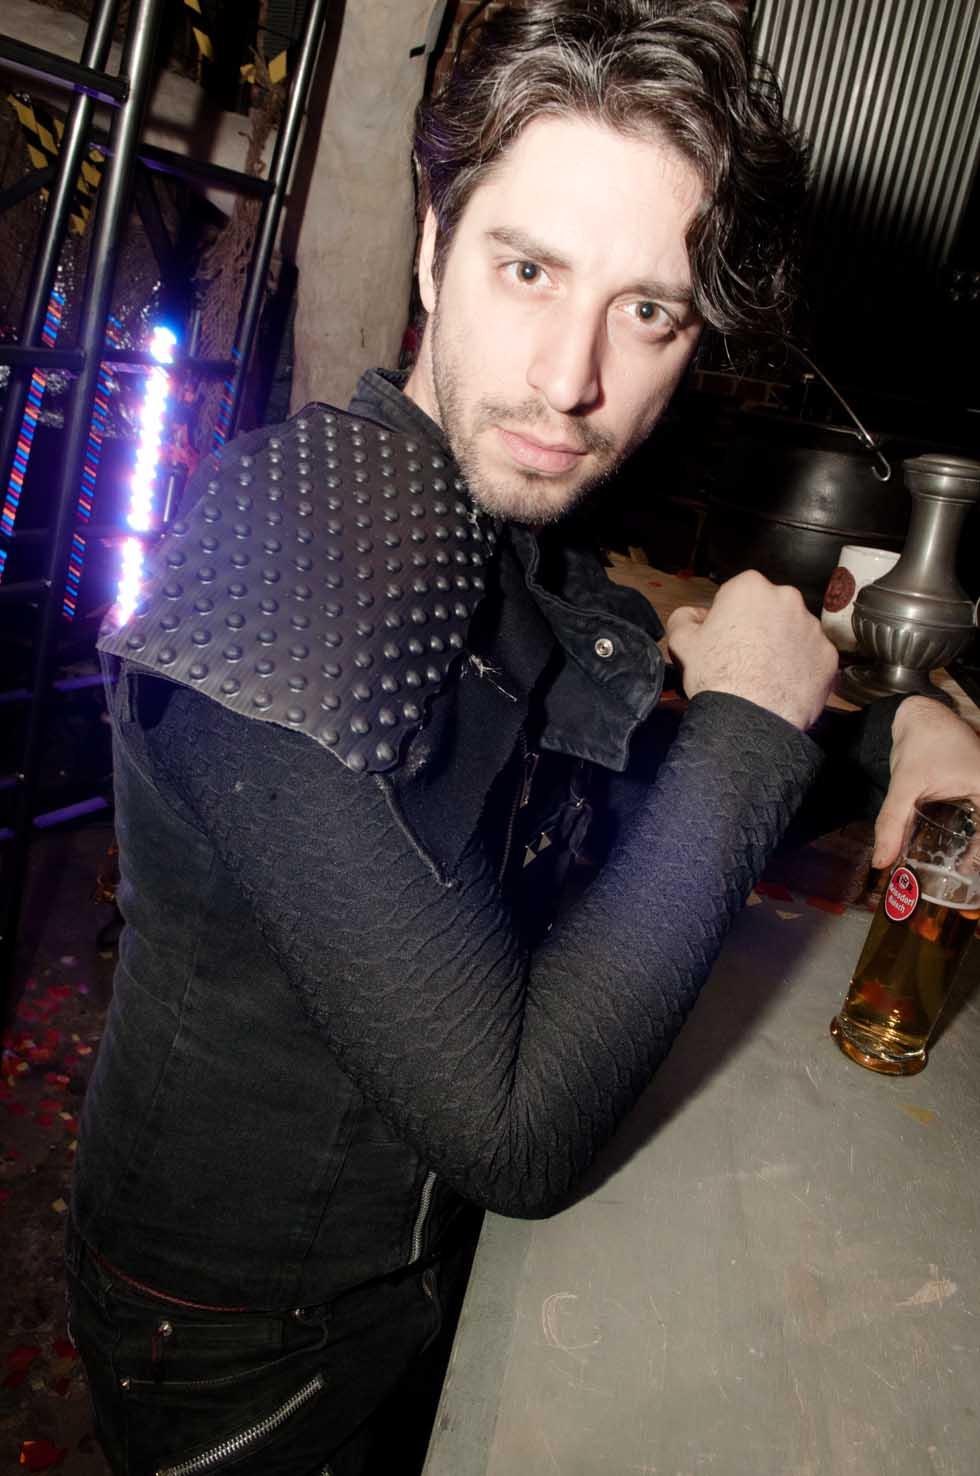 zum-schneider-nyc-2012-karneval-apocalyptika-3508.jpg